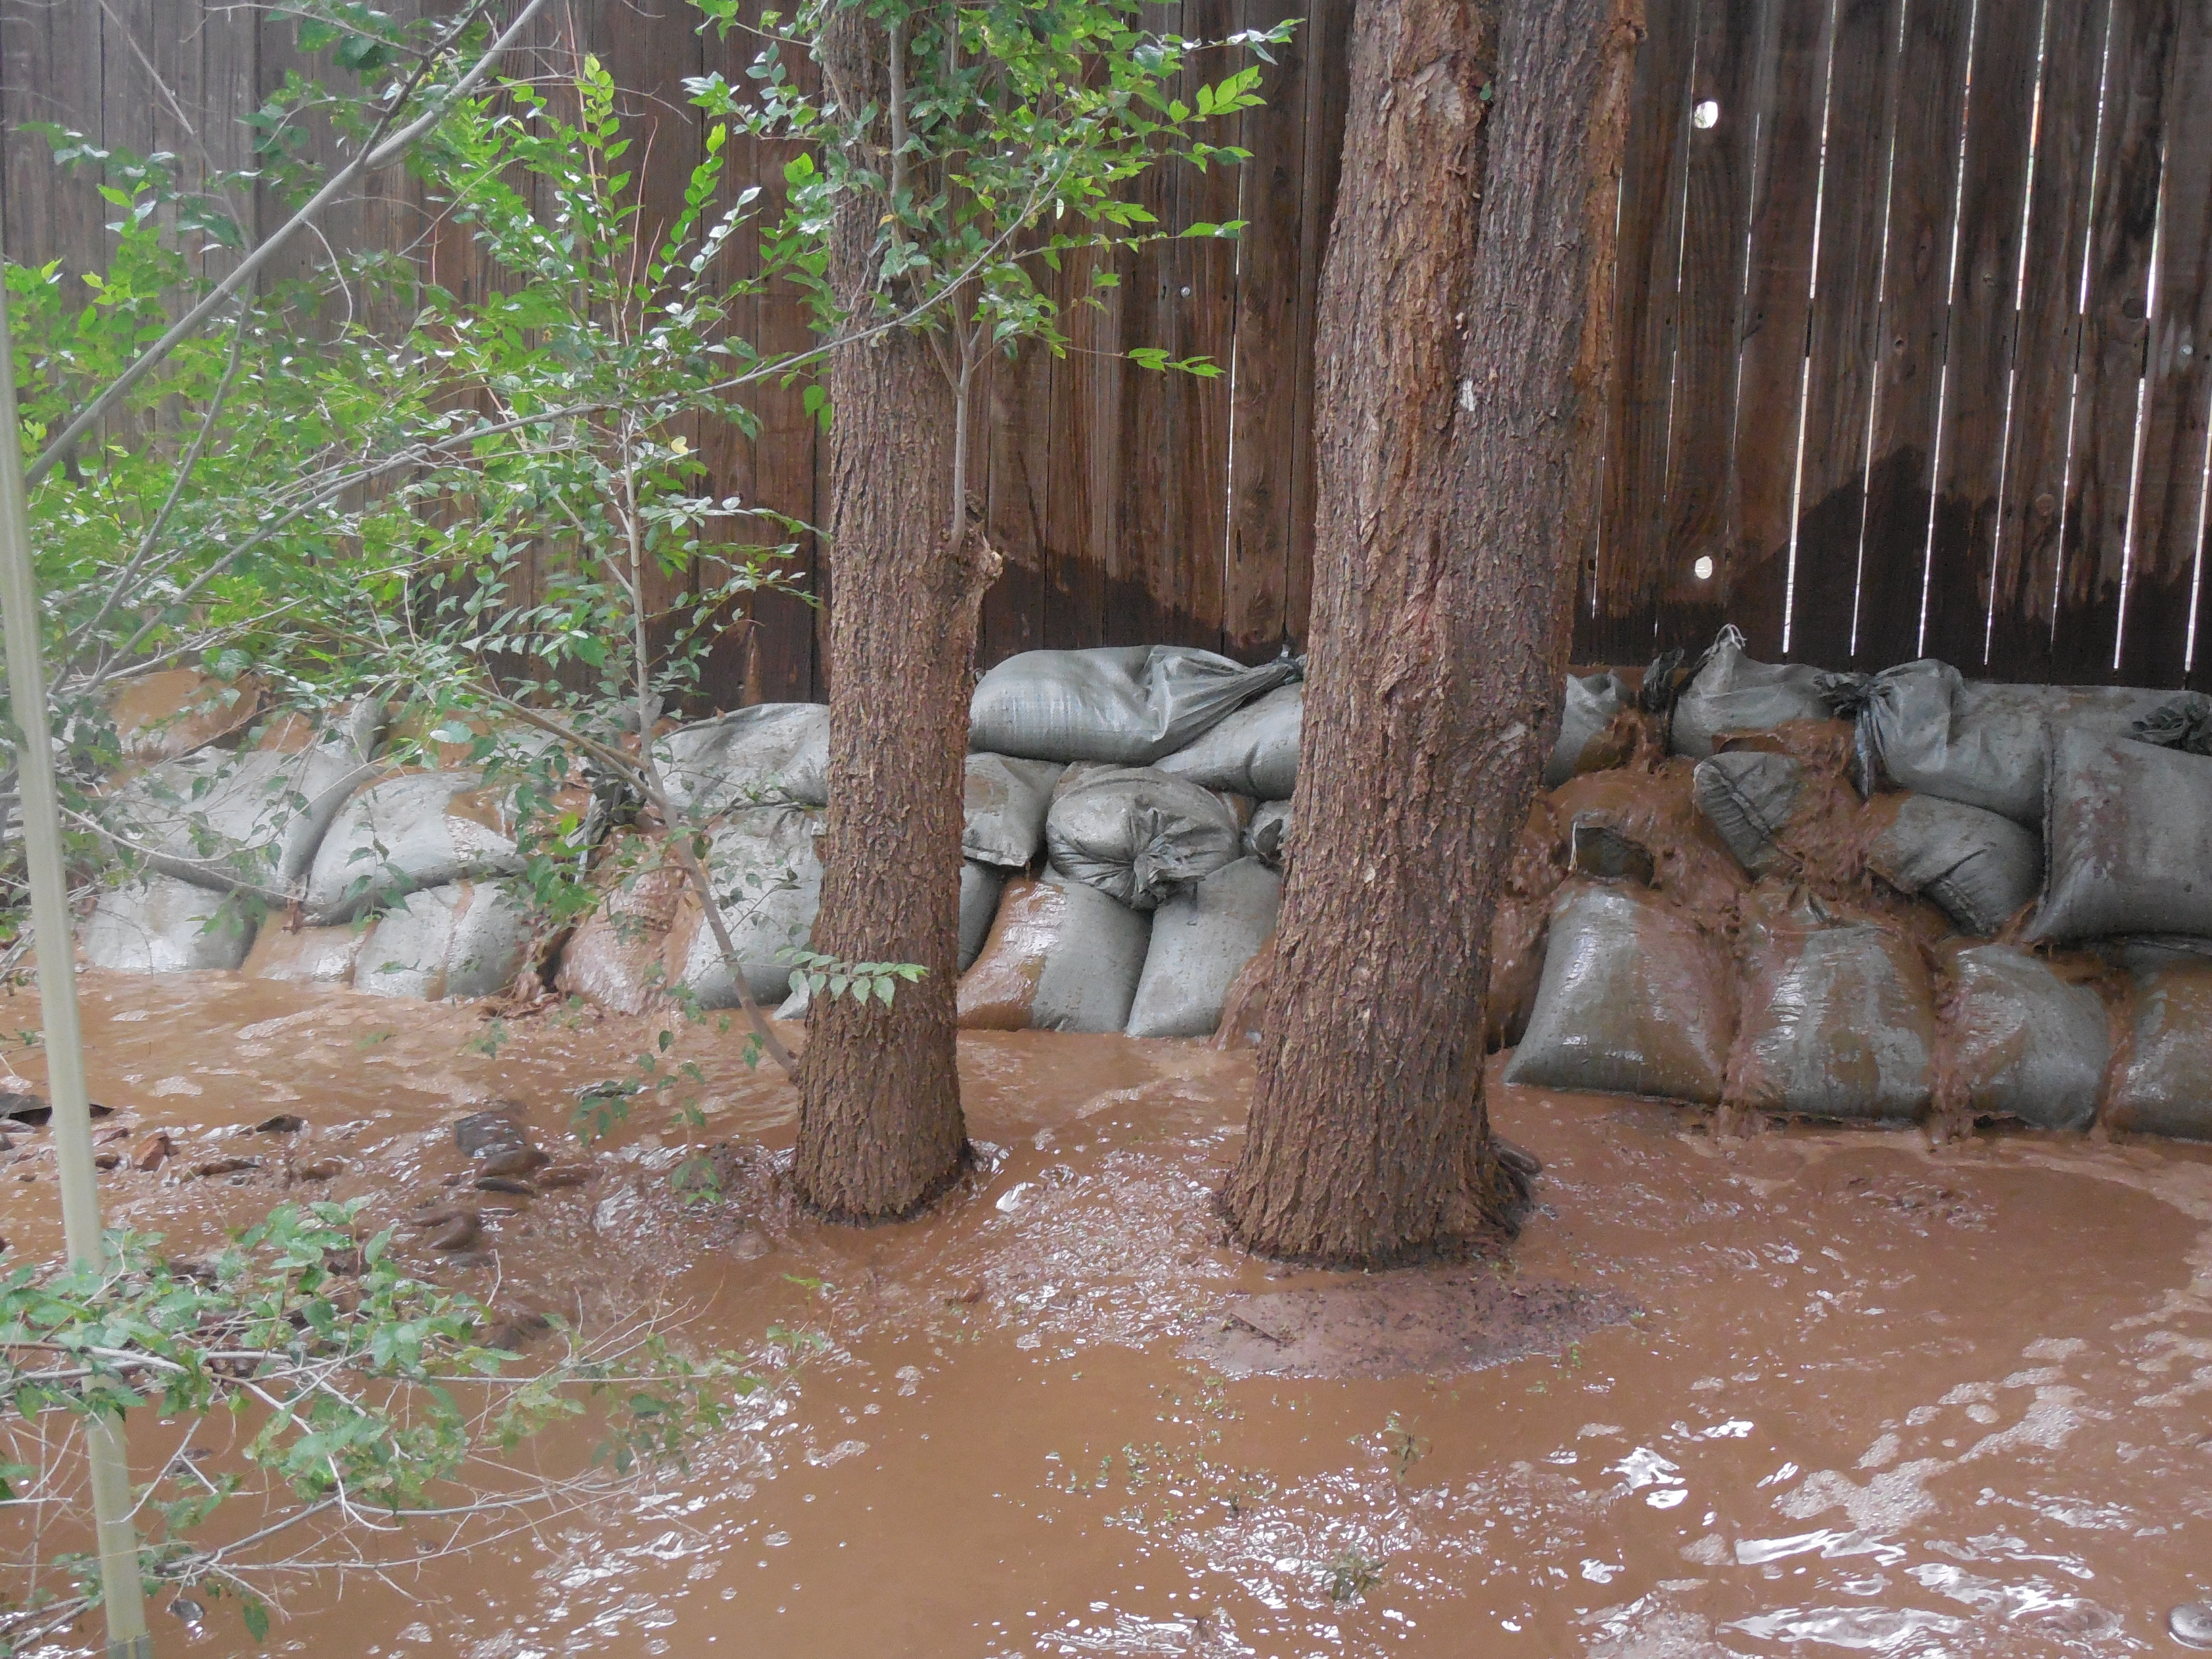 Wrong way to sandbag, water gets through!